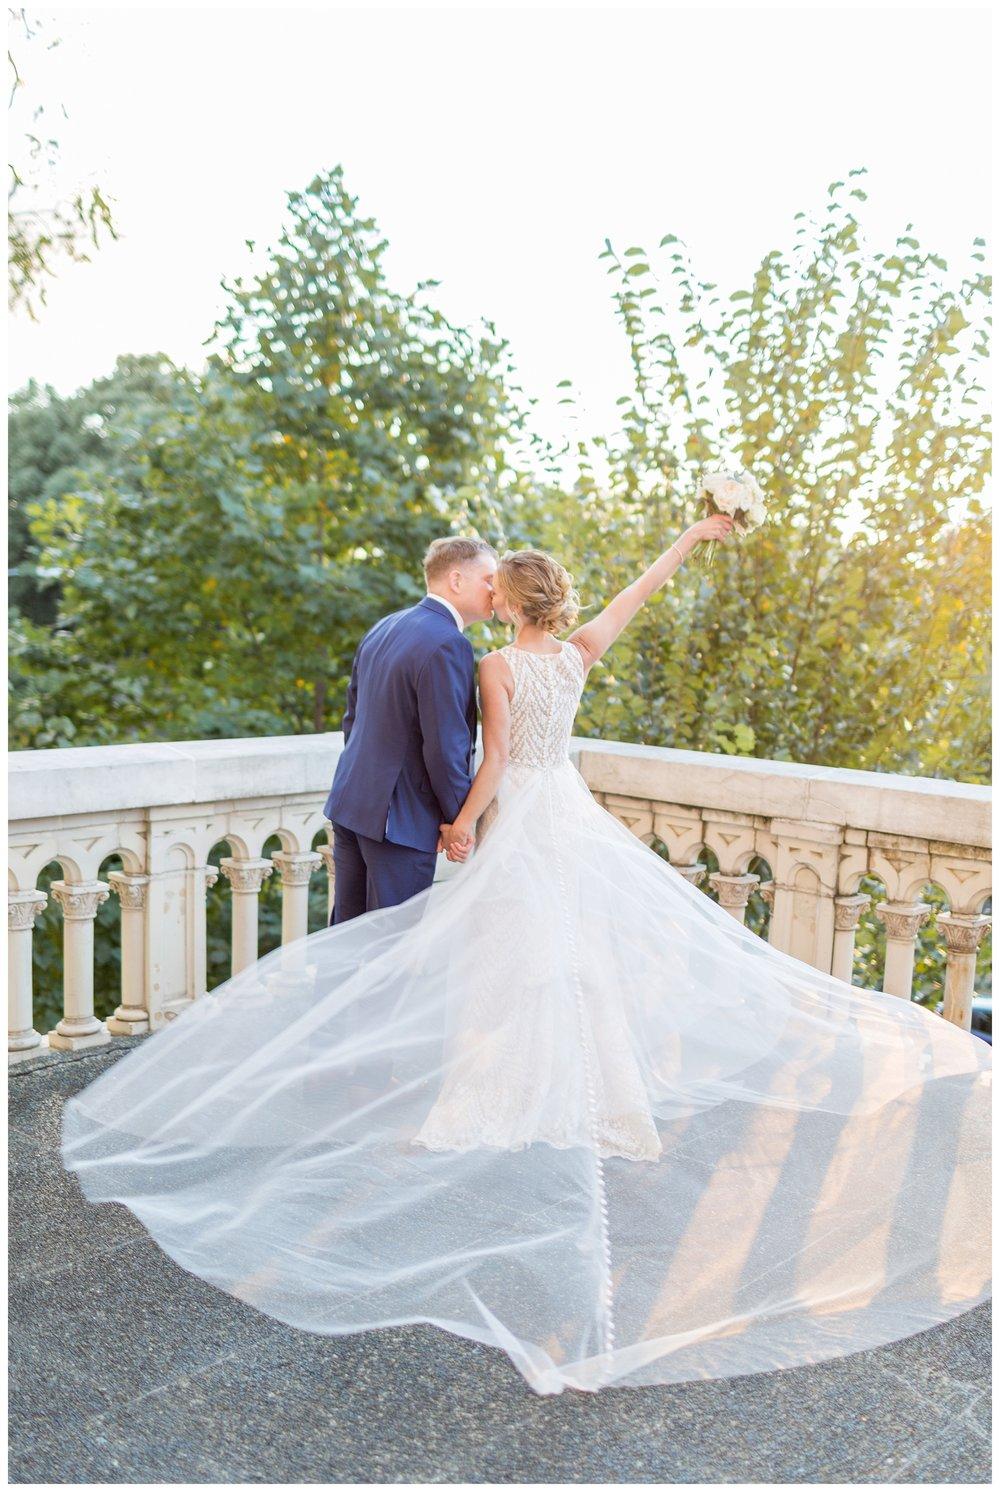 Meridian Hill Park Wedding | Washington DC Wedding Photographer Kir Tuben_0085.jpg